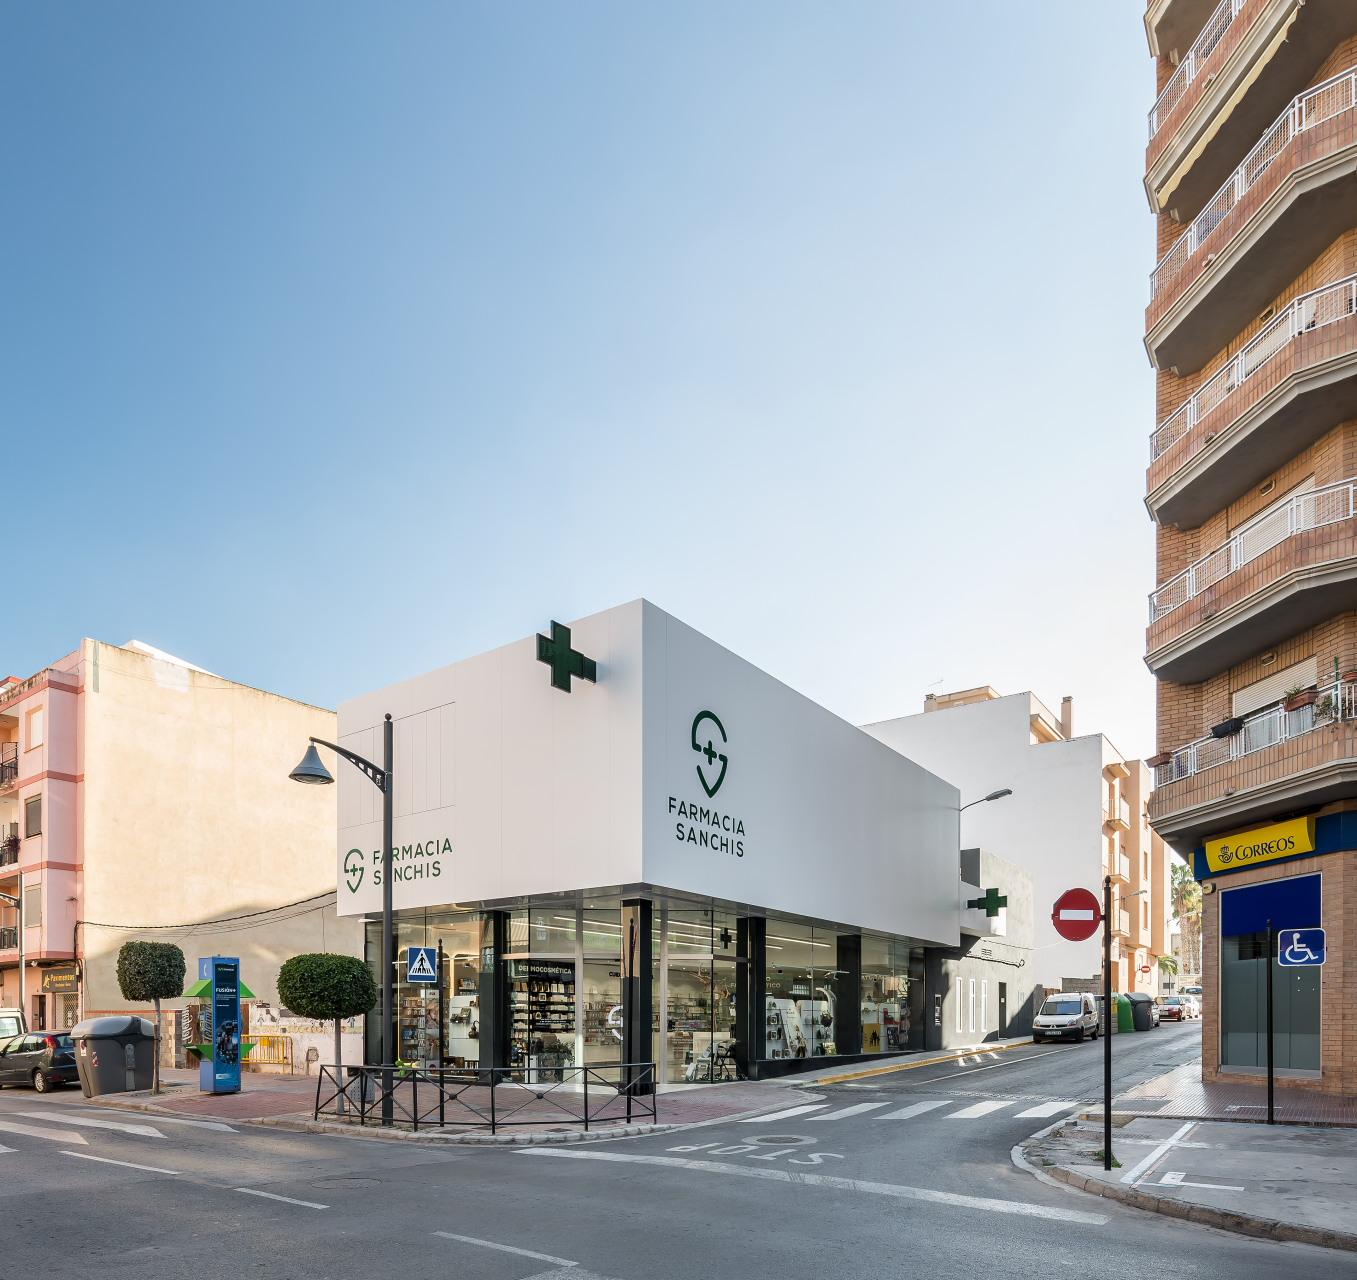 fotografia-arquitectura-valencia-german-cabo-d'estudio-farmacia-sanchis-ribarroja (2)